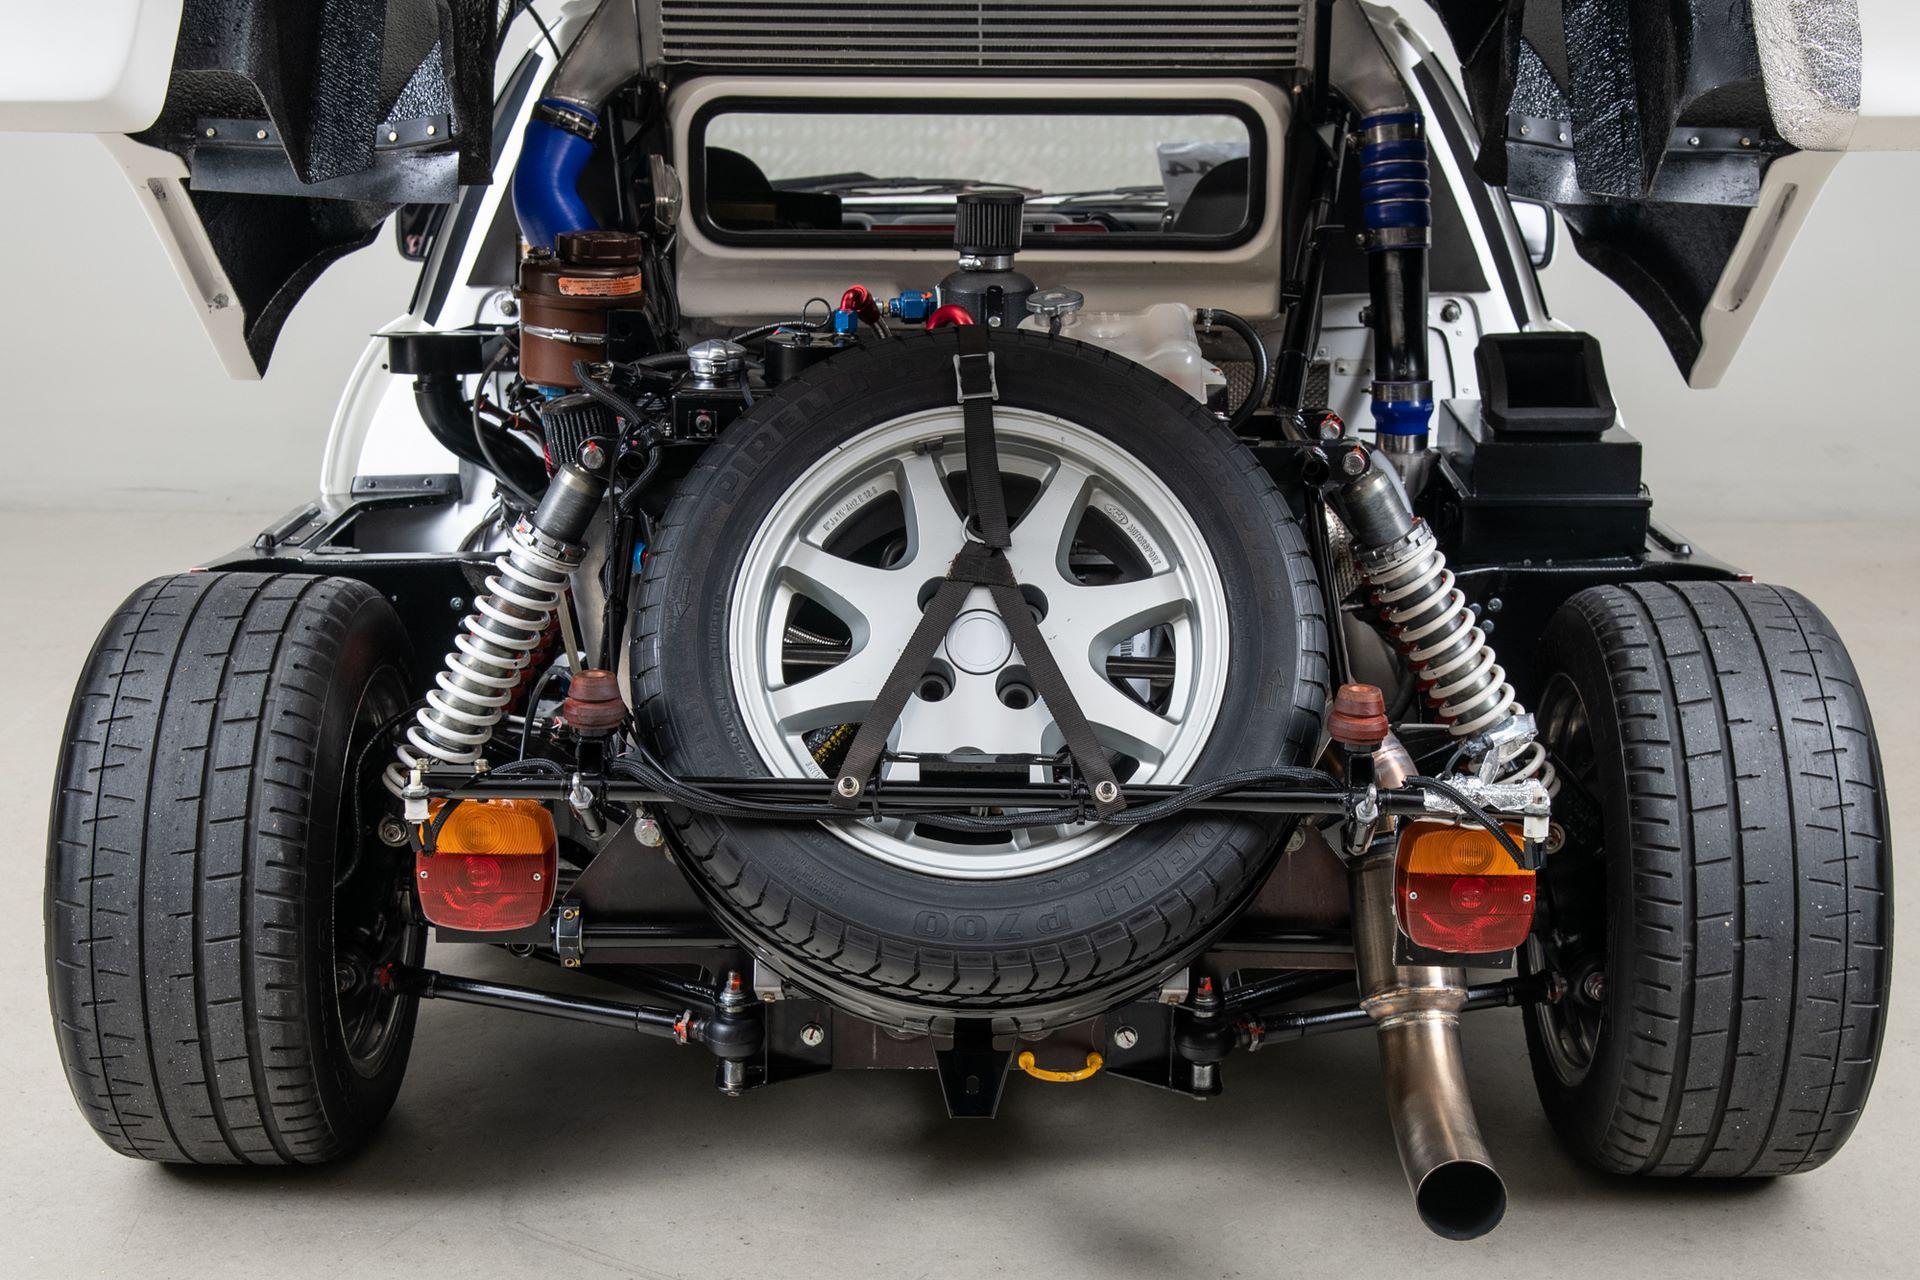 Ford-RS200-Evolution-Evo-for-sale-24